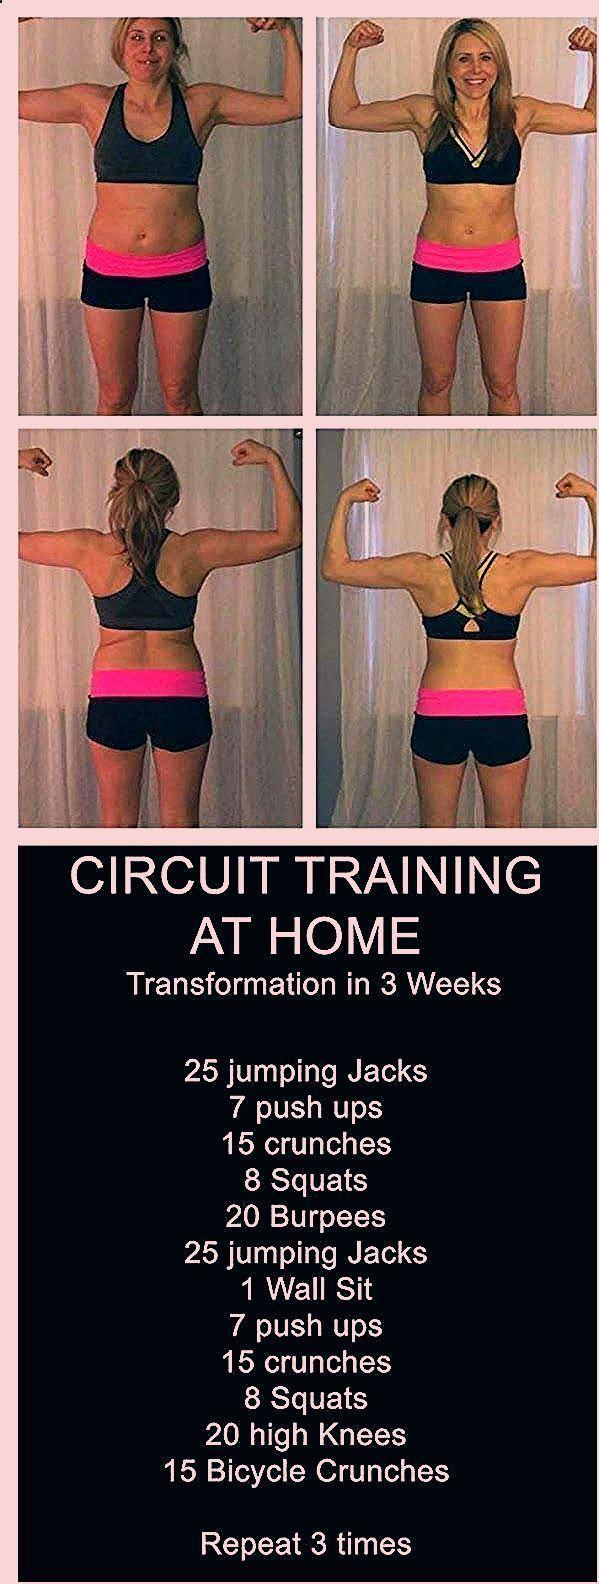 #DROP #easiest #Fast #fitness #gerate #Haus #kurze workouts für zu hause #Program #DROP #easiest #Fa...